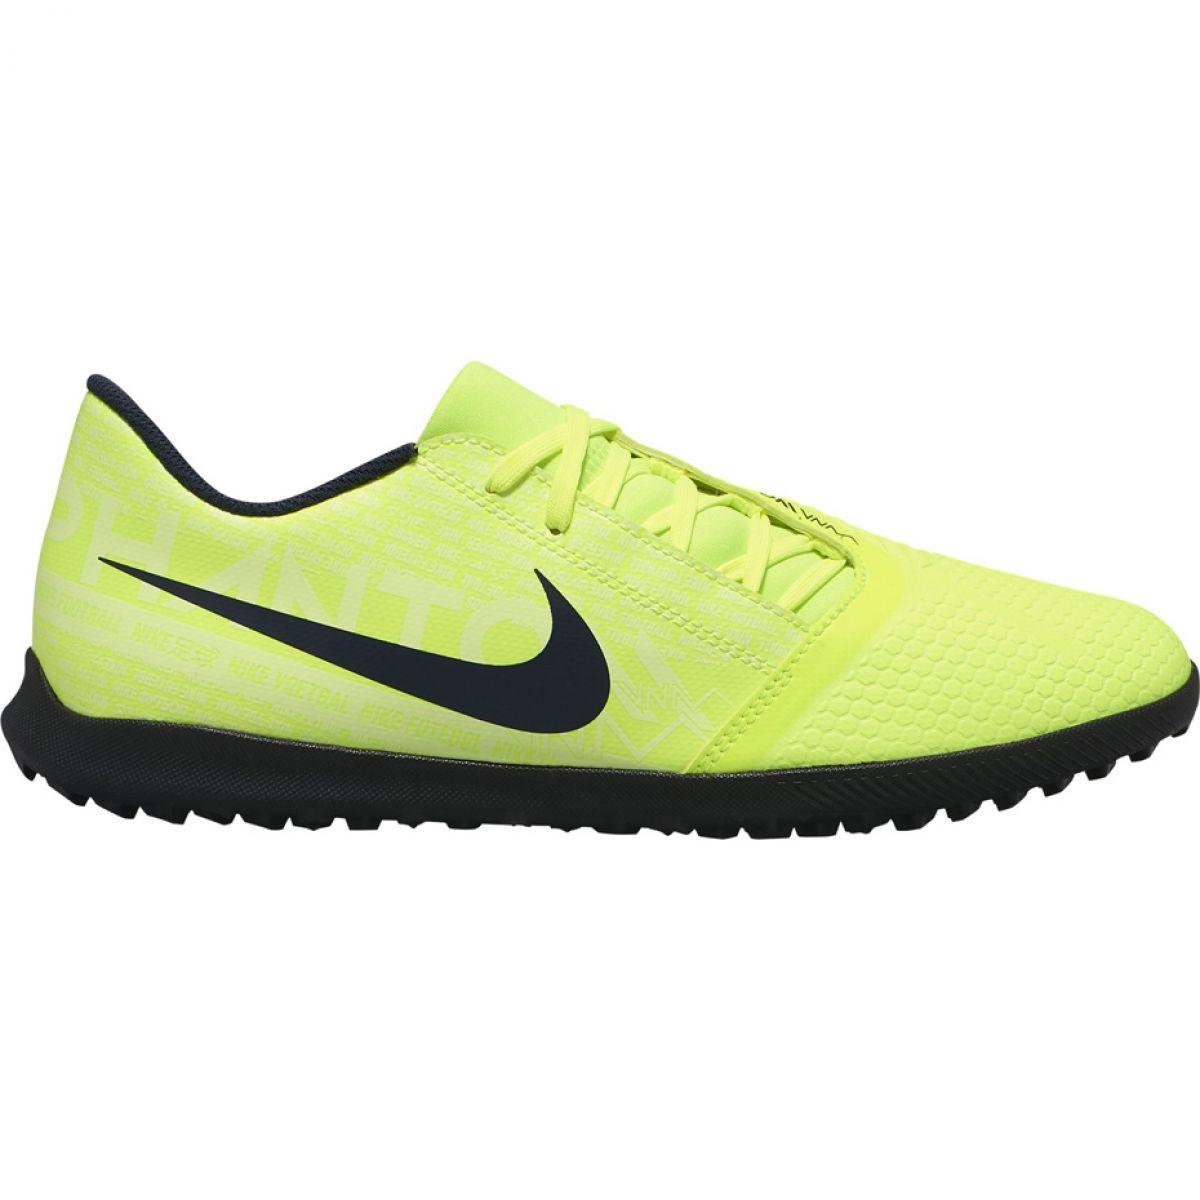 Zapatillas de fútbol Nike Phantom Venom Club Tf M AO0579 717 verde